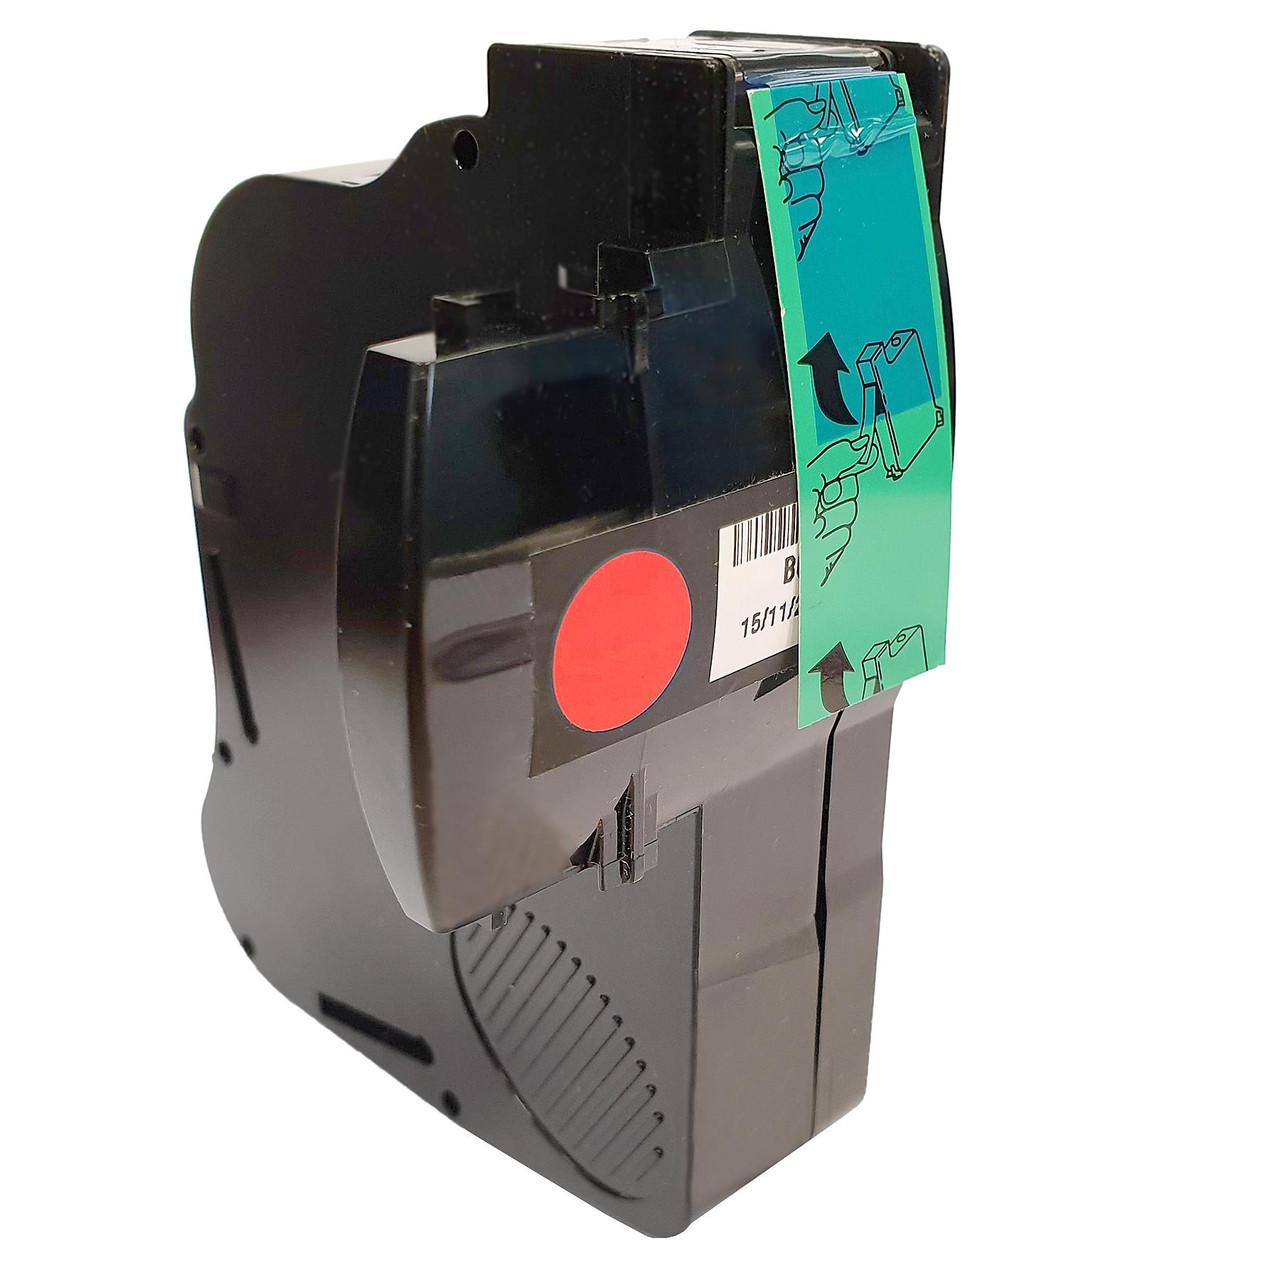 Original NEOPOST / QUADIENT IS200 IS240 IS280 Ink Cartridge